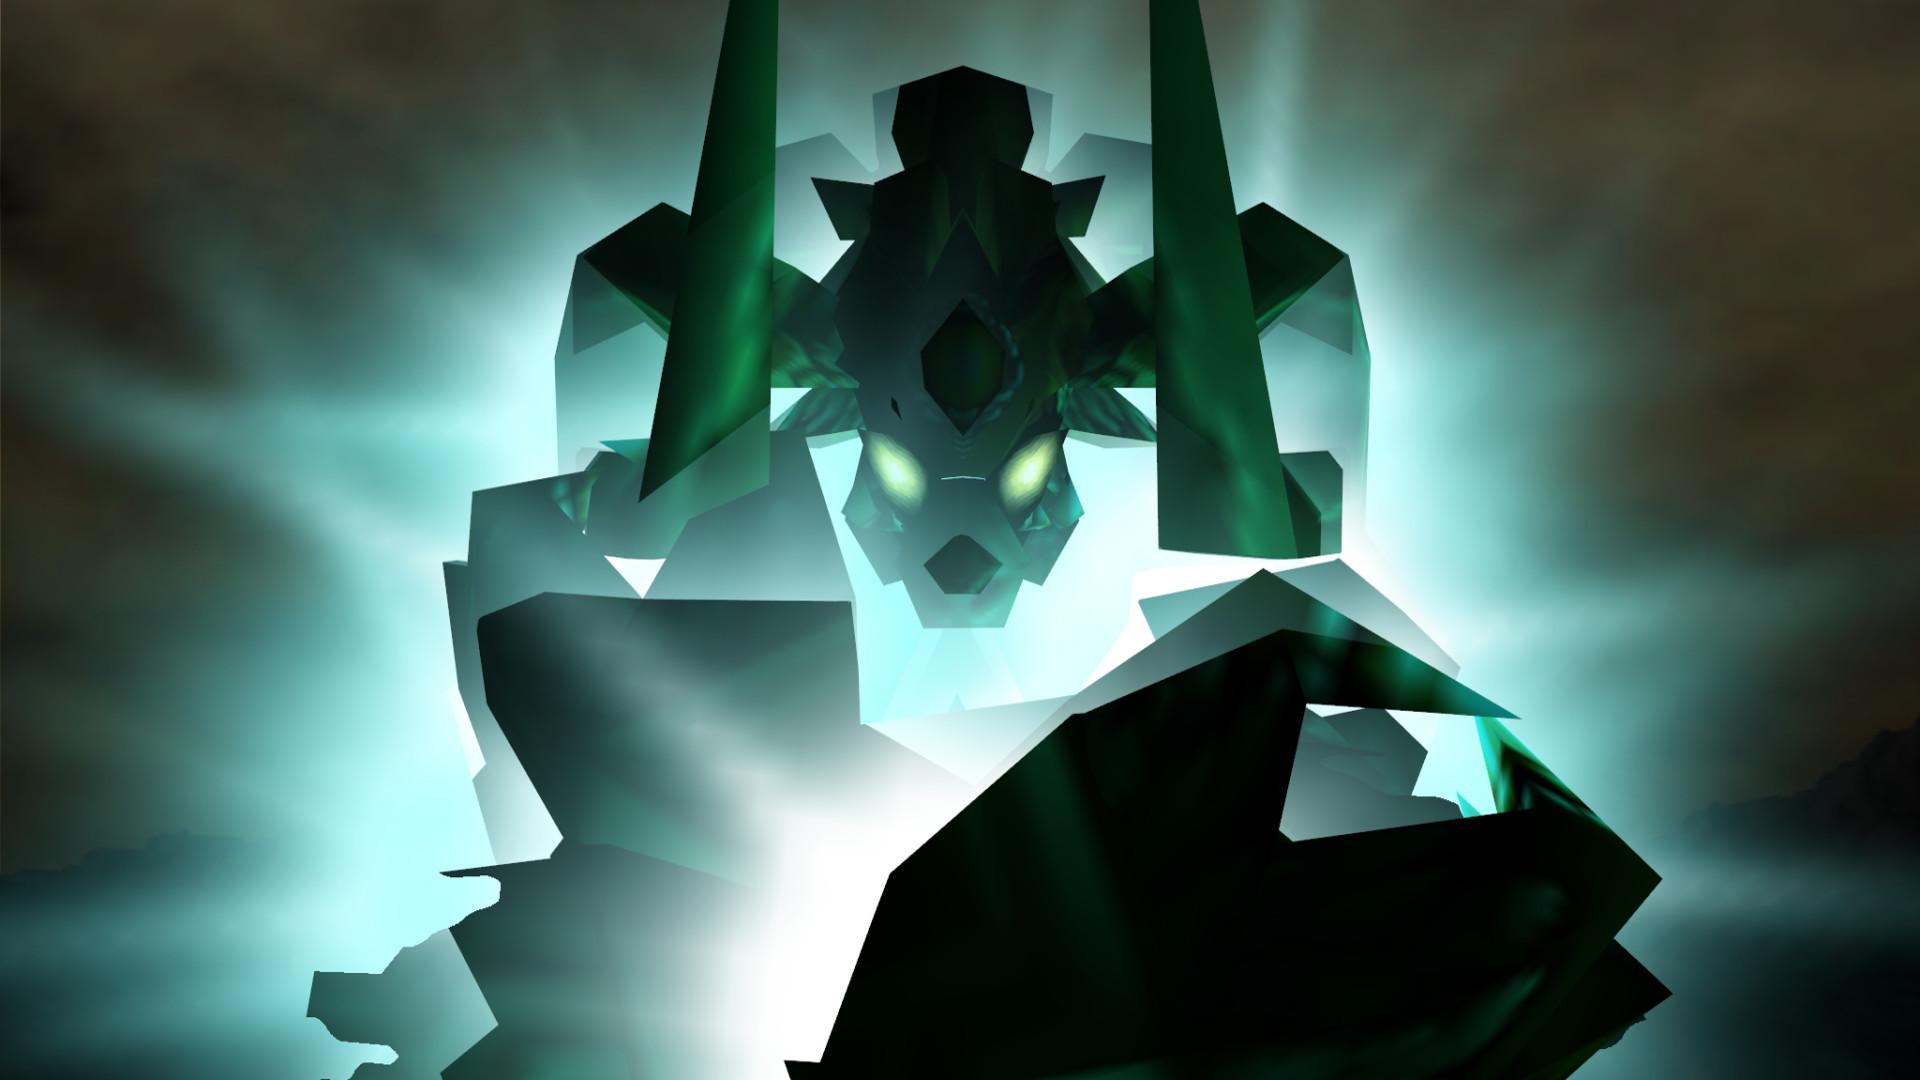 Ganon Ocarina Of Time